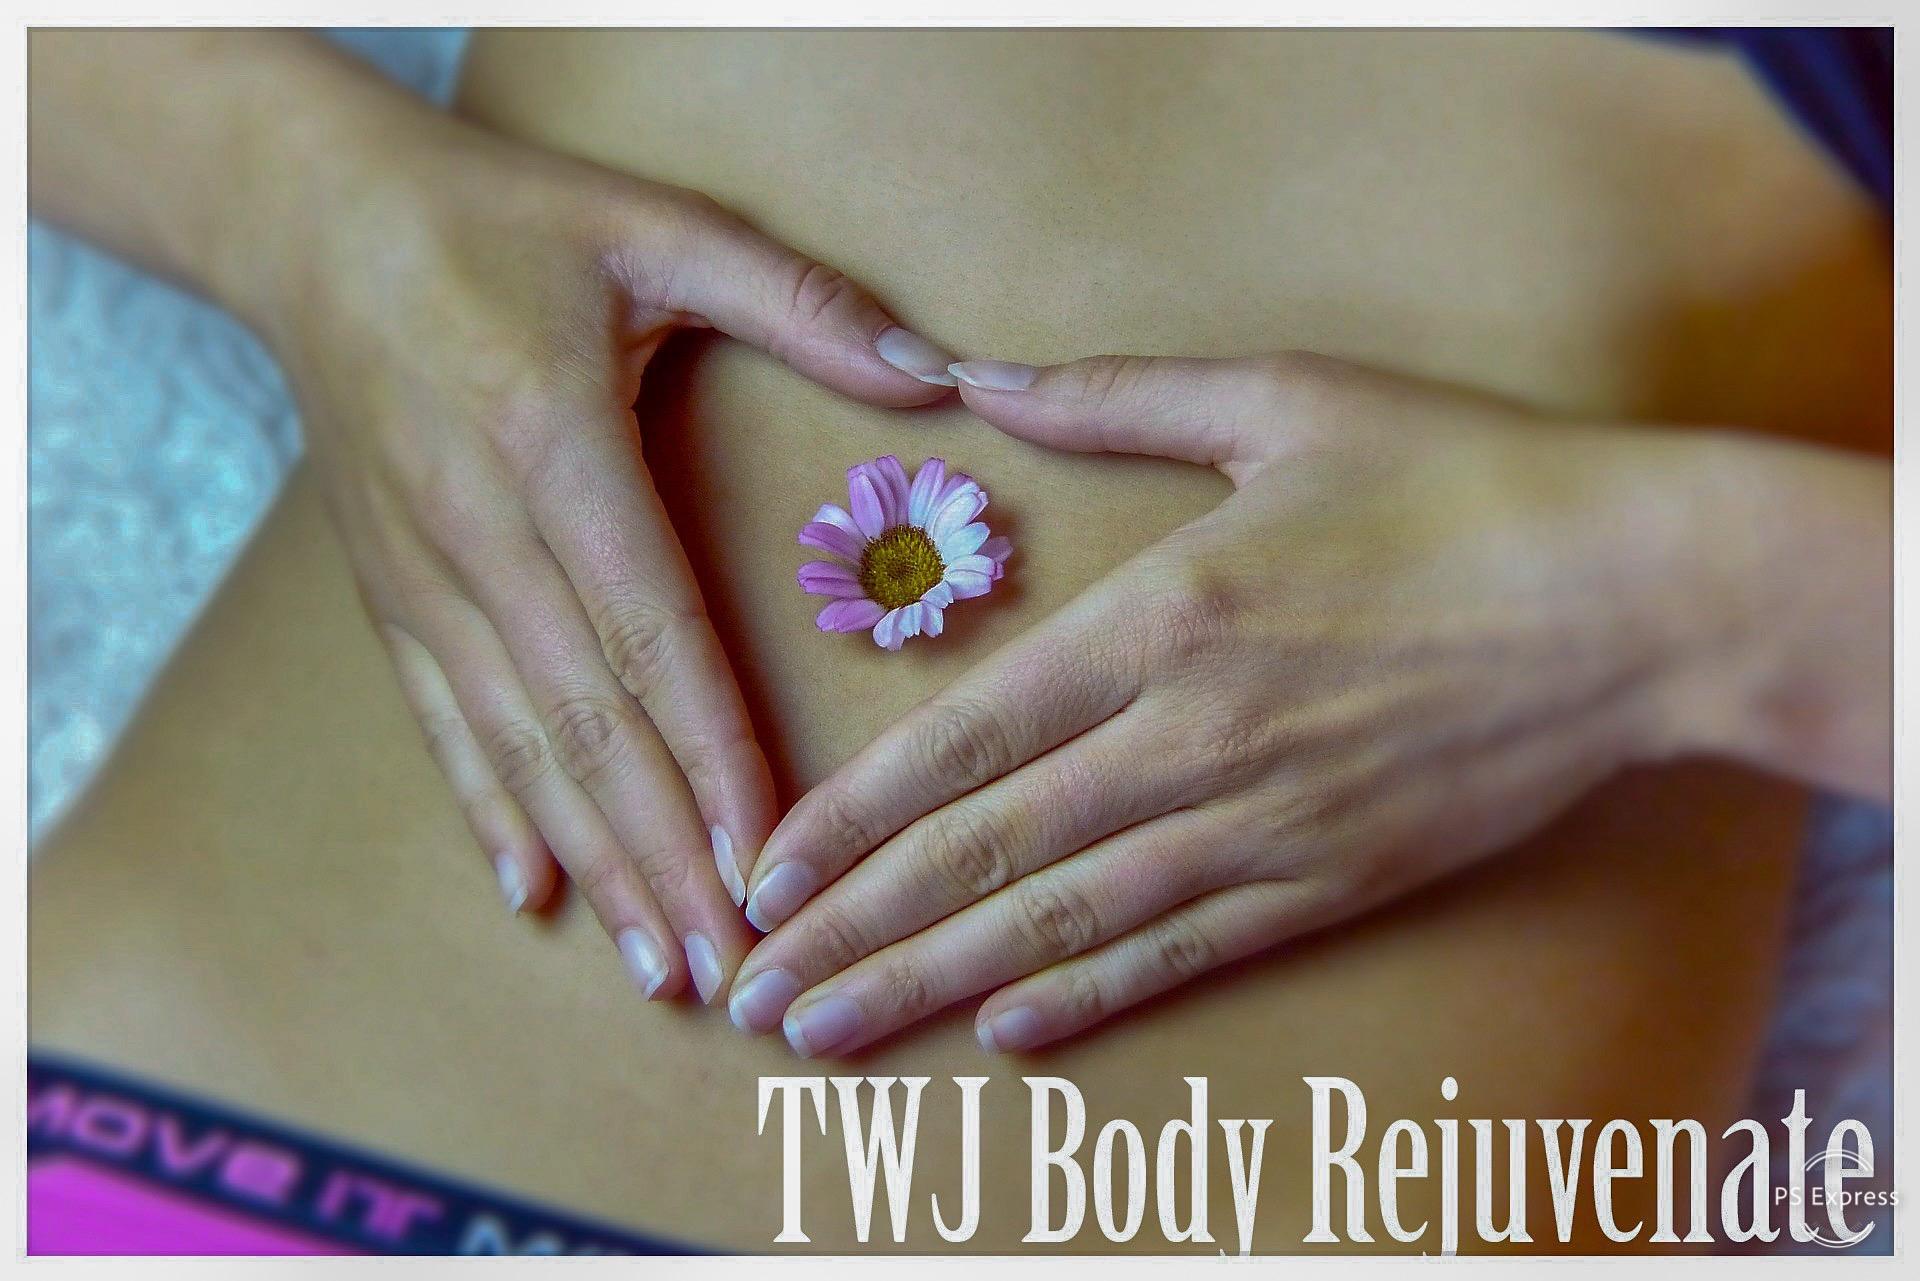 TWJ January Body Rejuvenate